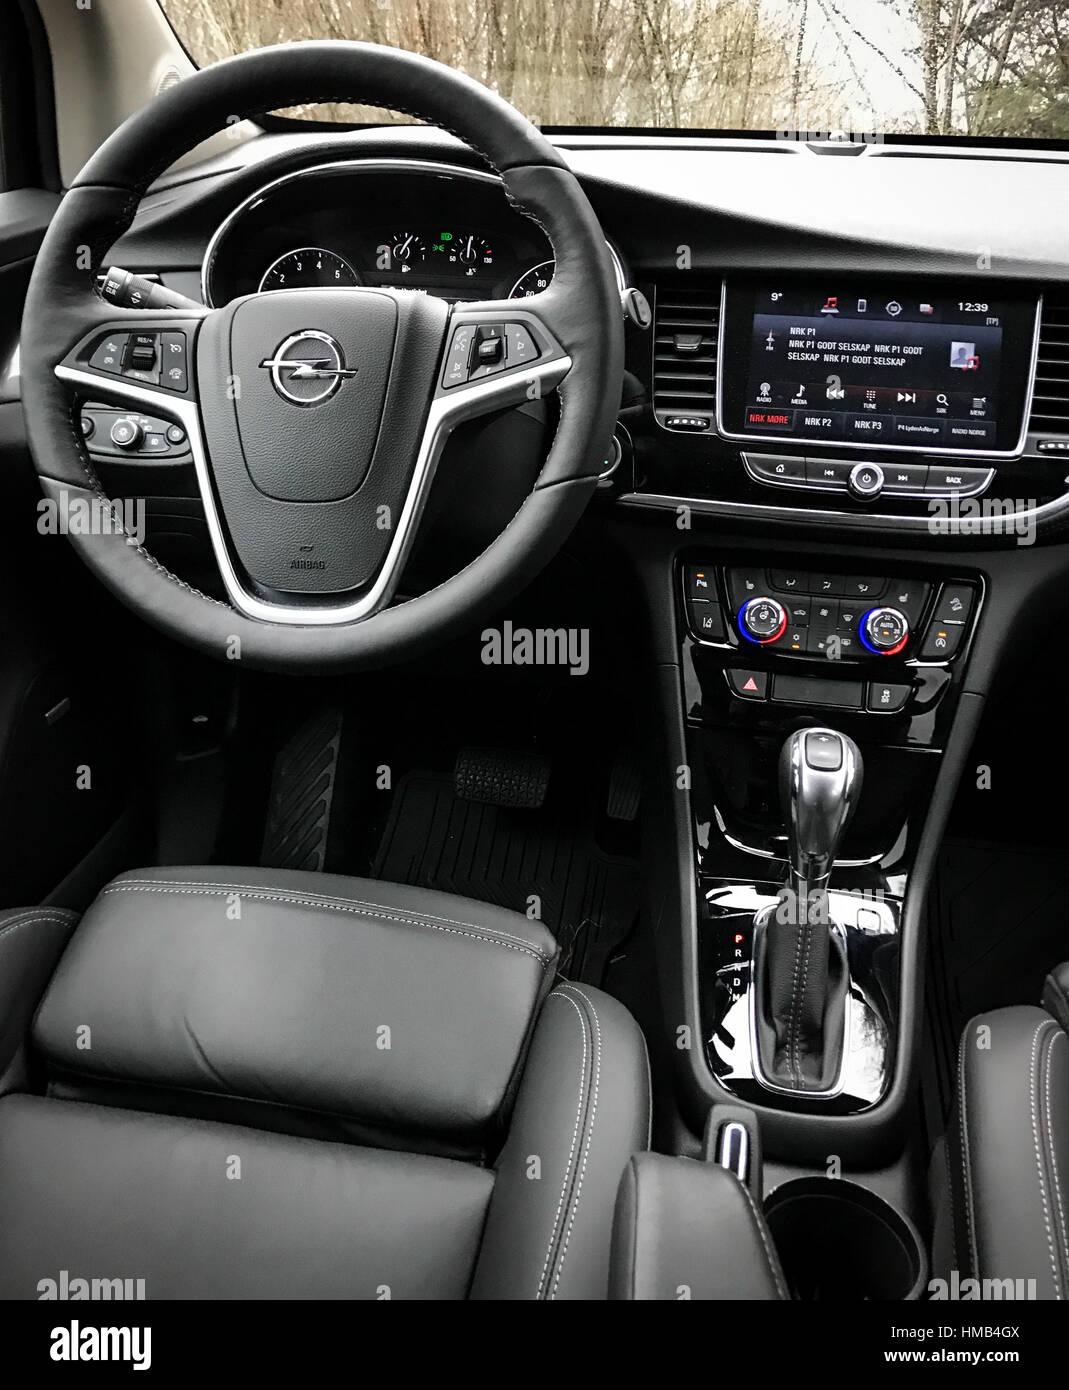 opel car steering wheel stockfotos opel car steering wheel bilder alamy. Black Bedroom Furniture Sets. Home Design Ideas